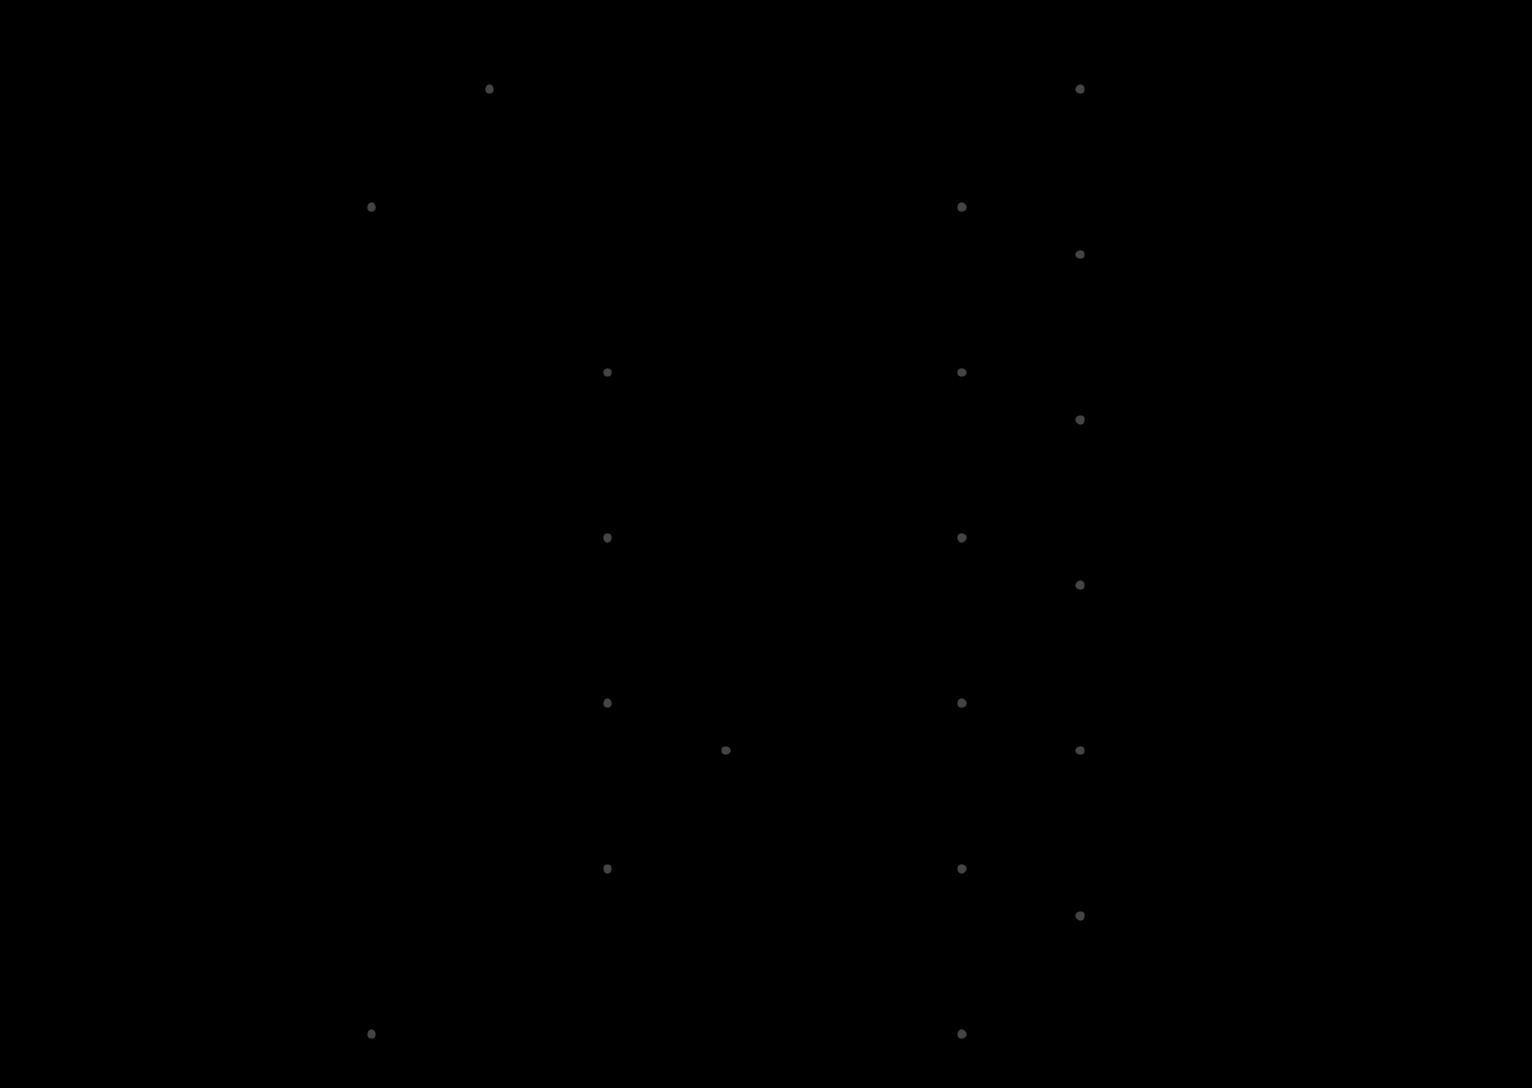 Bild: Volumen des Körpers E